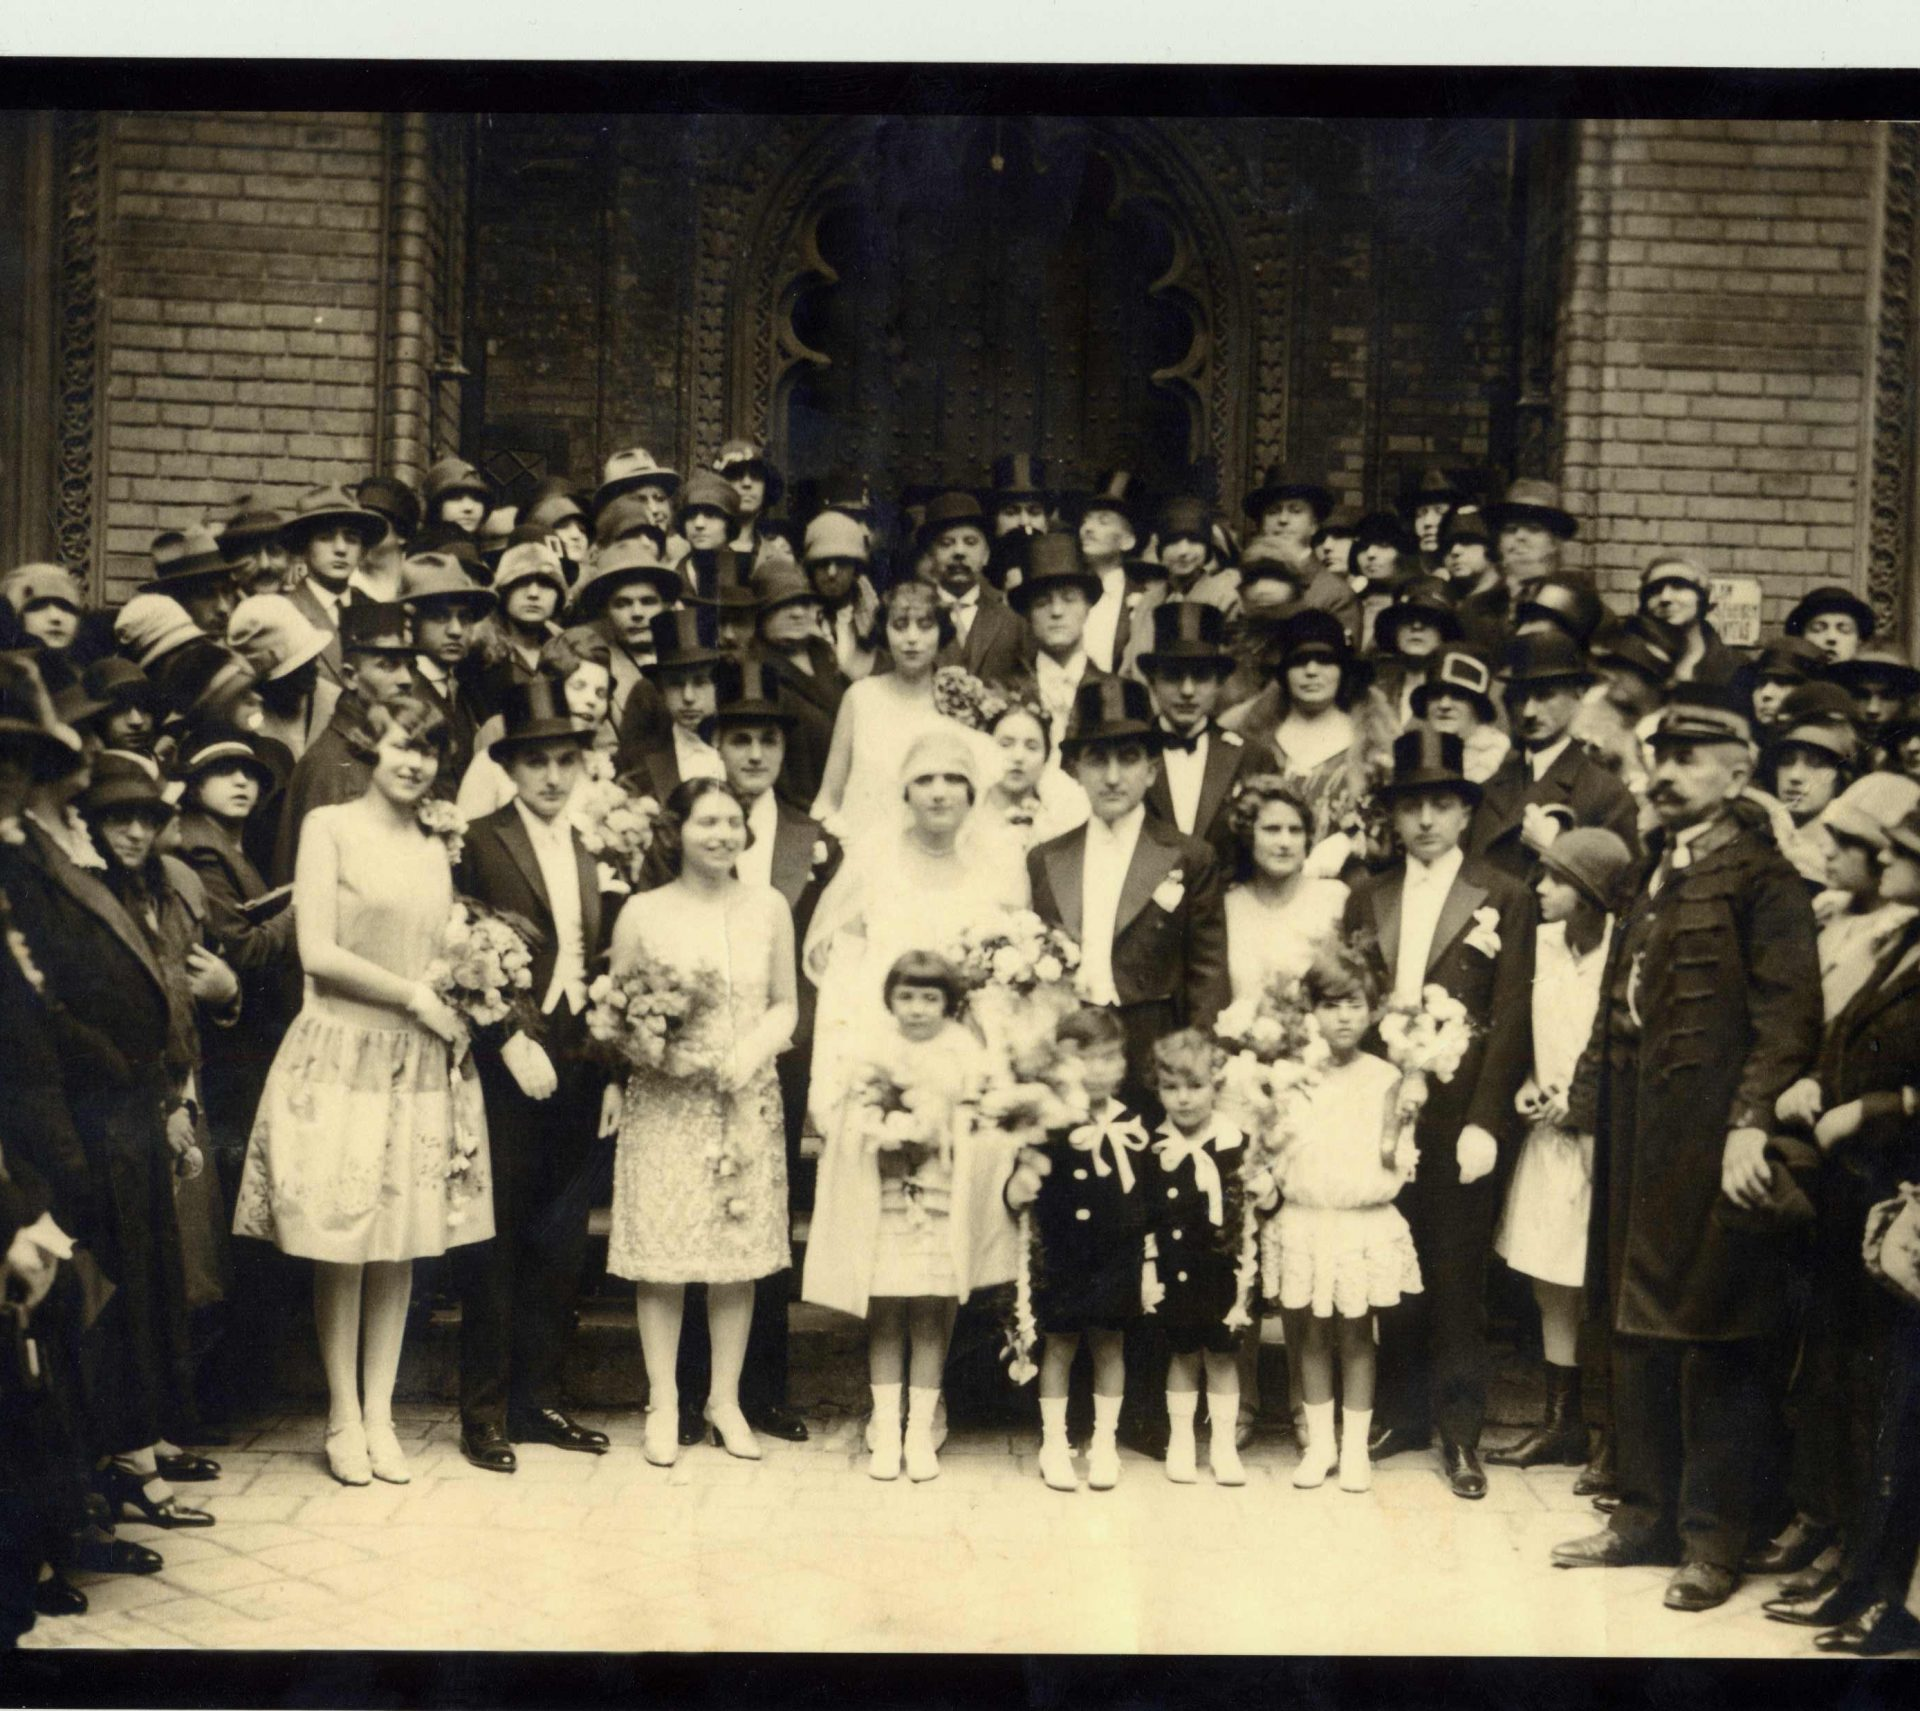 Mariage de Zigmund Barna et Elisabeth Molnar, Budapest, 1926.